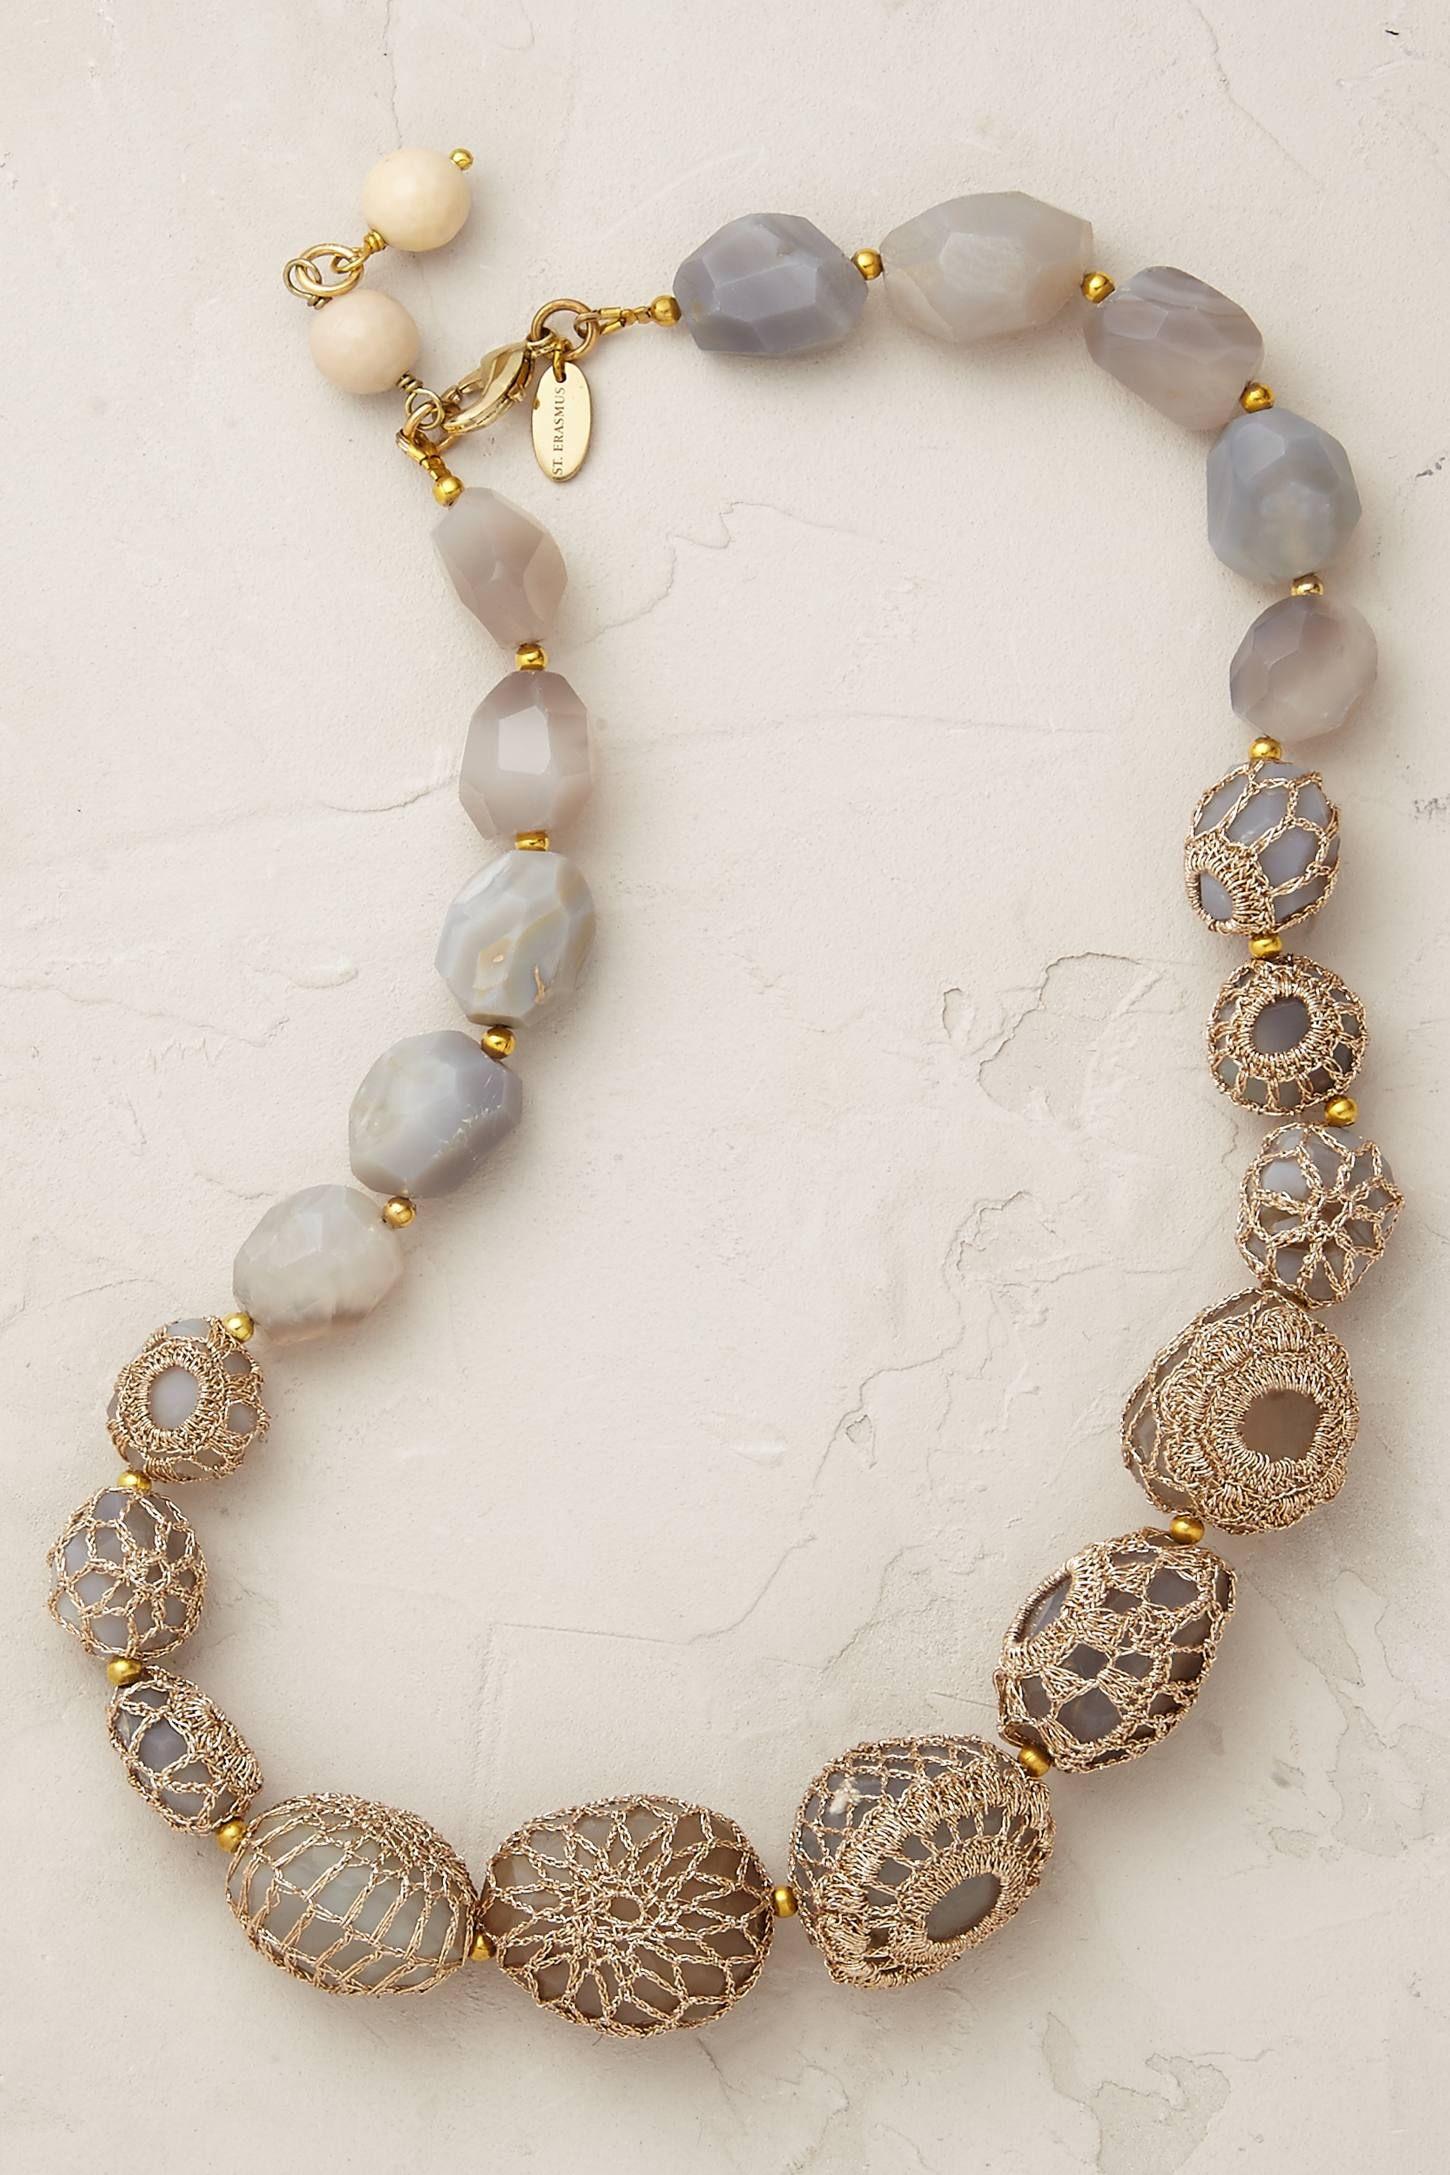 Cassia Crochet Necklace   Jewellery   Pinterest   Collares, Joyerías ...